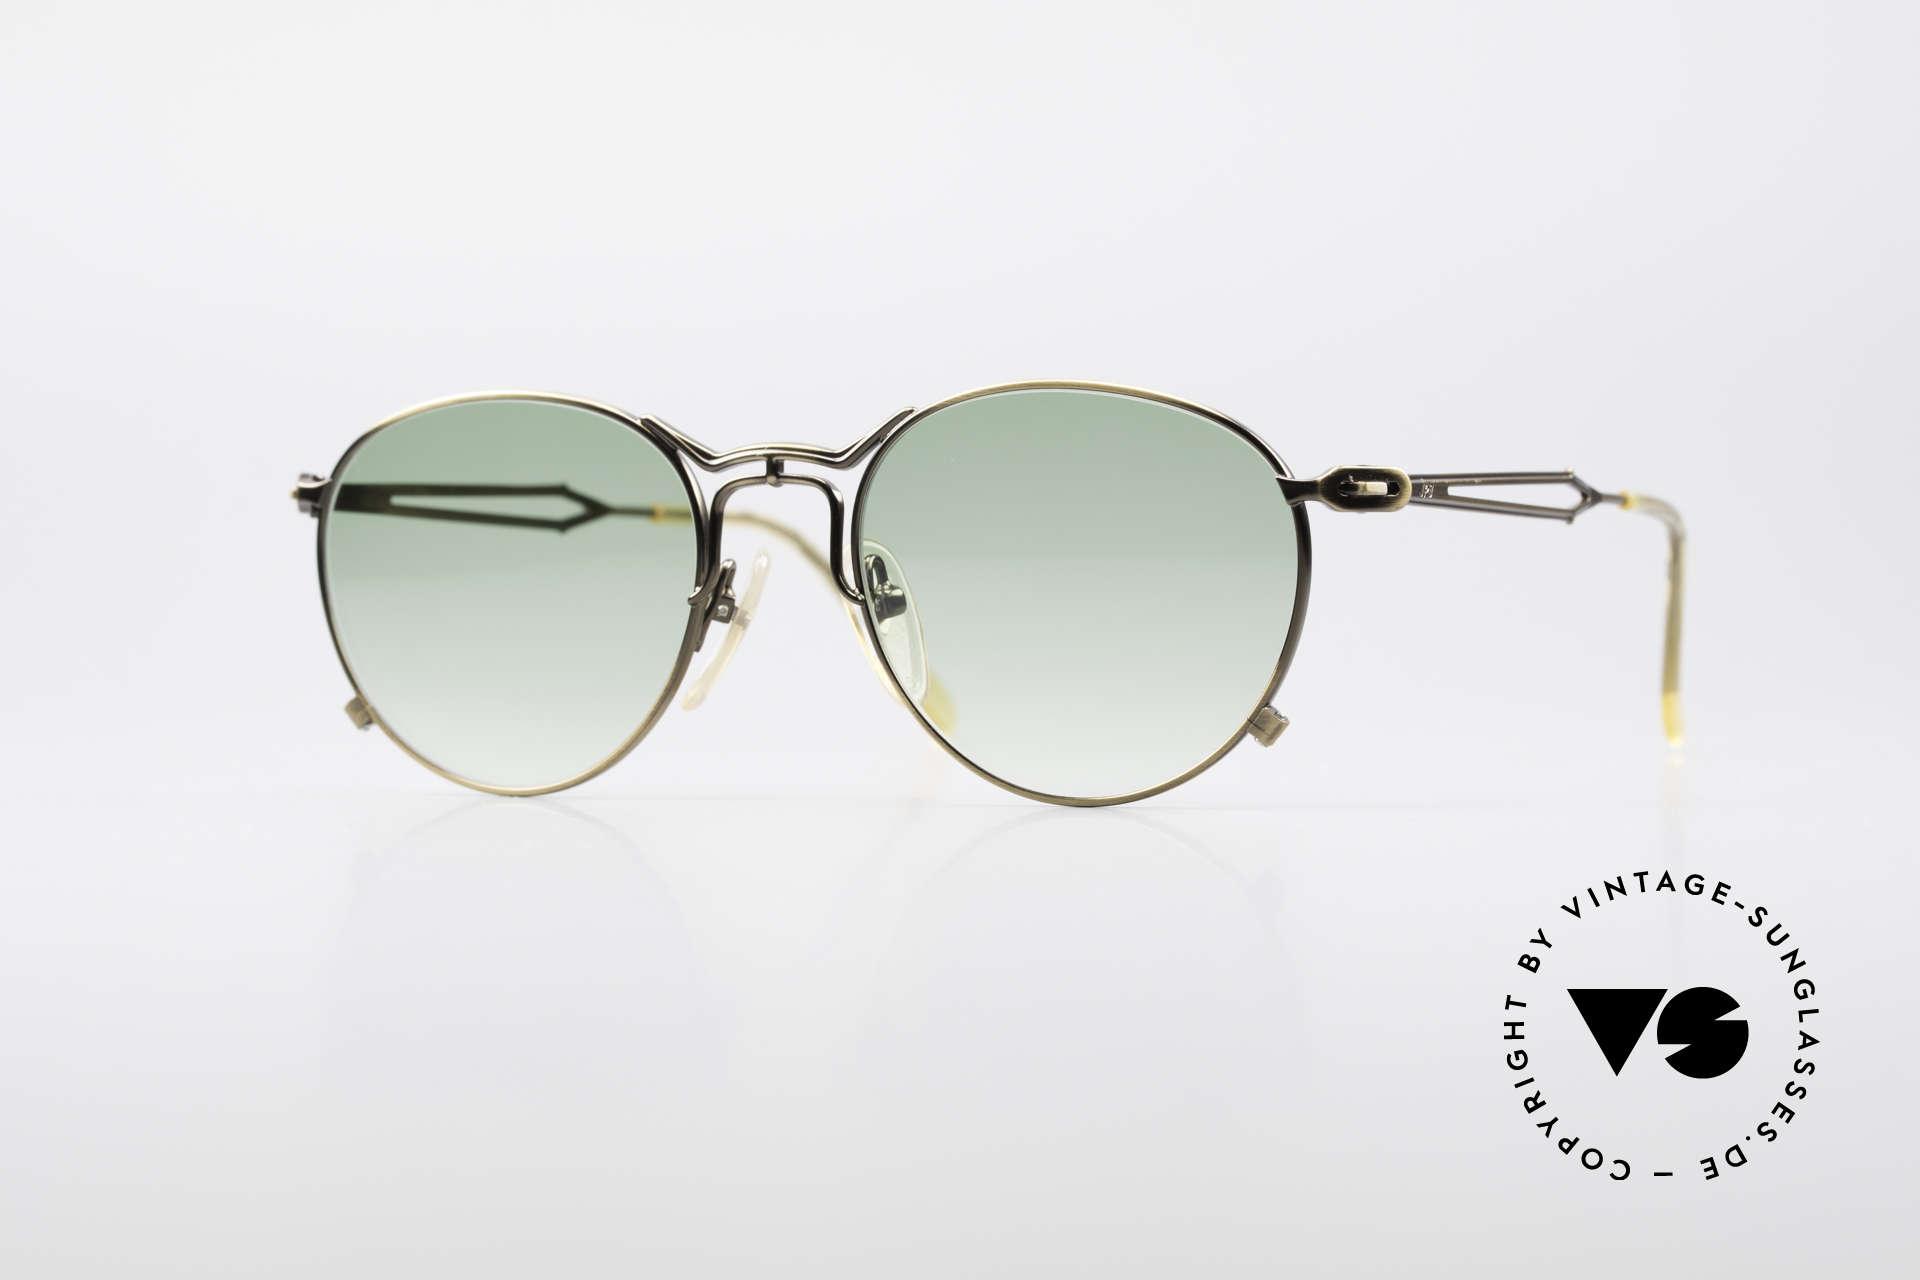 Jean Paul Gaultier 55-2177 True Vintage No Retro Frame, extraordinary vintage JP Gaultier designer sunglasses, Made for Men and Women